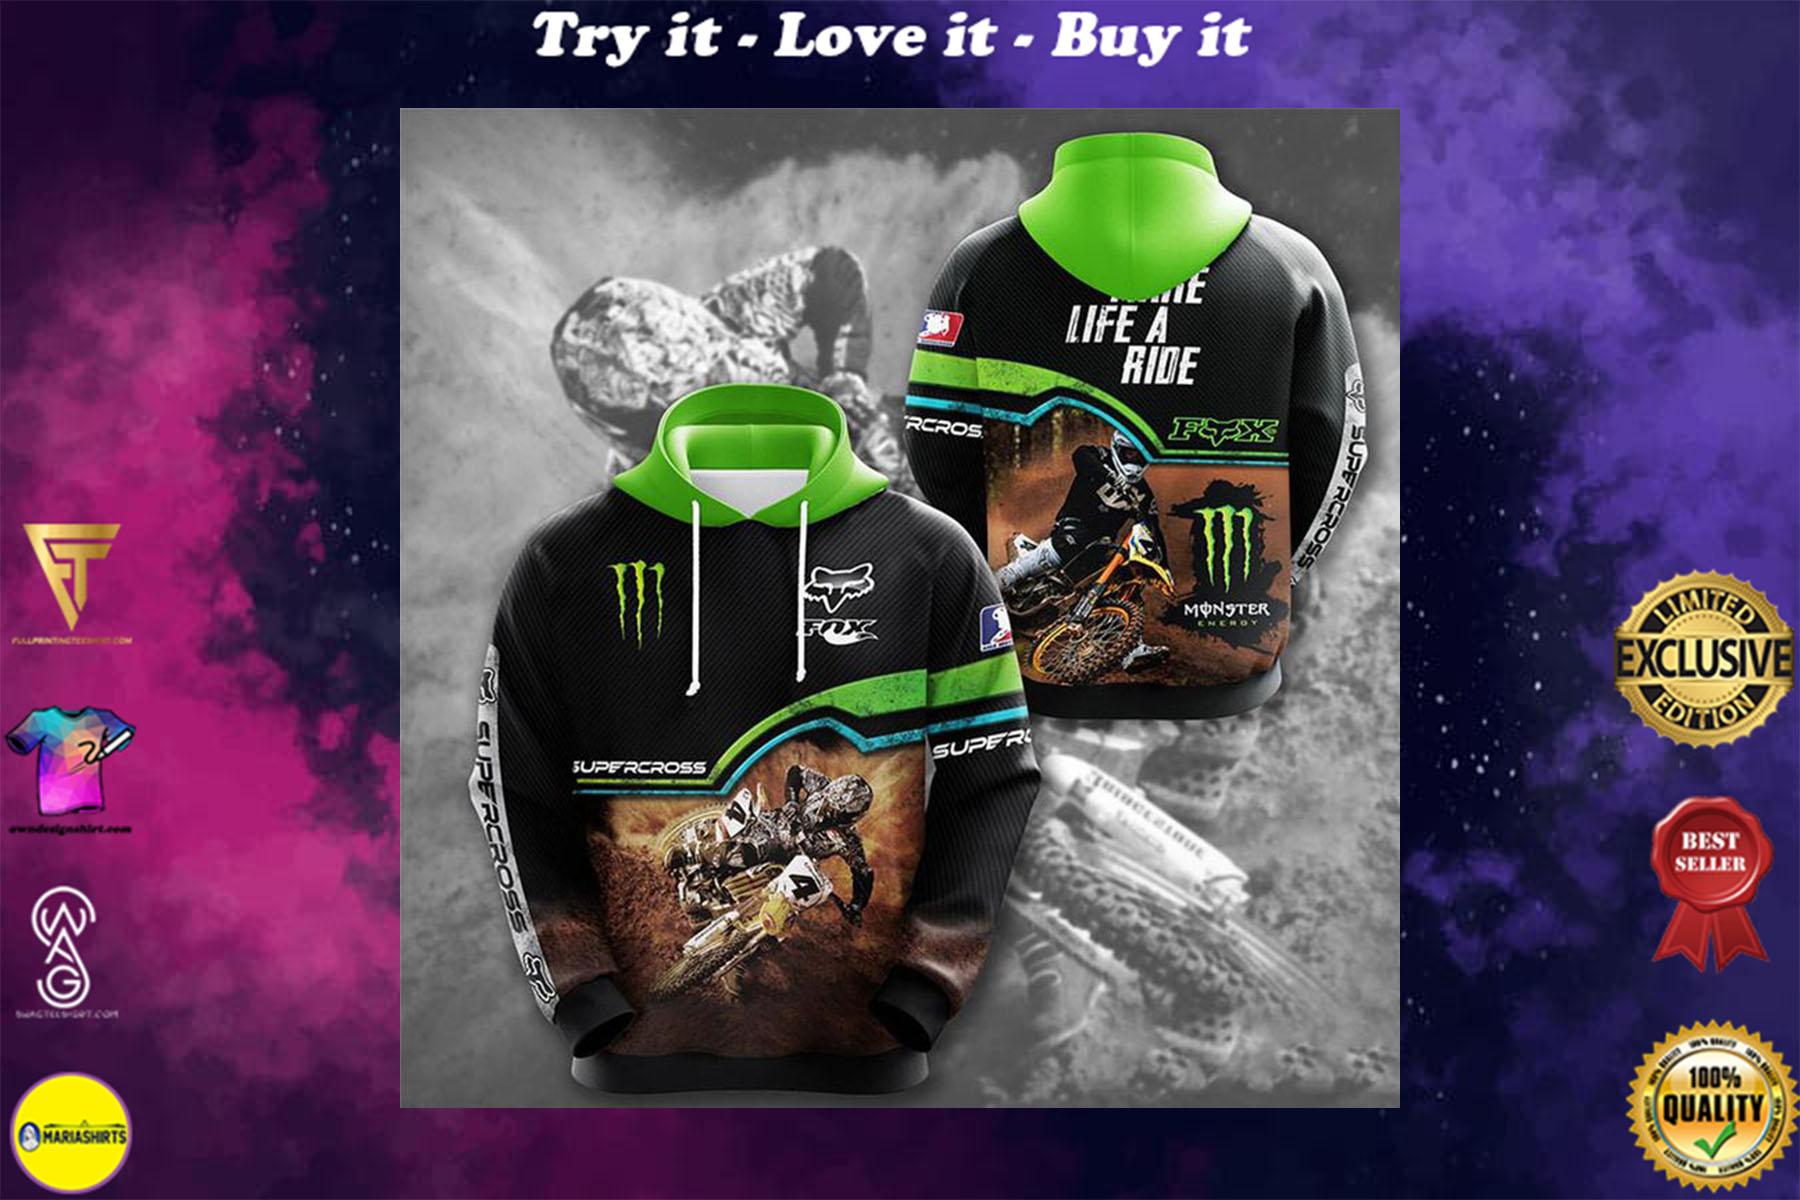 [special edition] monster energy fox racing motorcross full printing shirt - maria